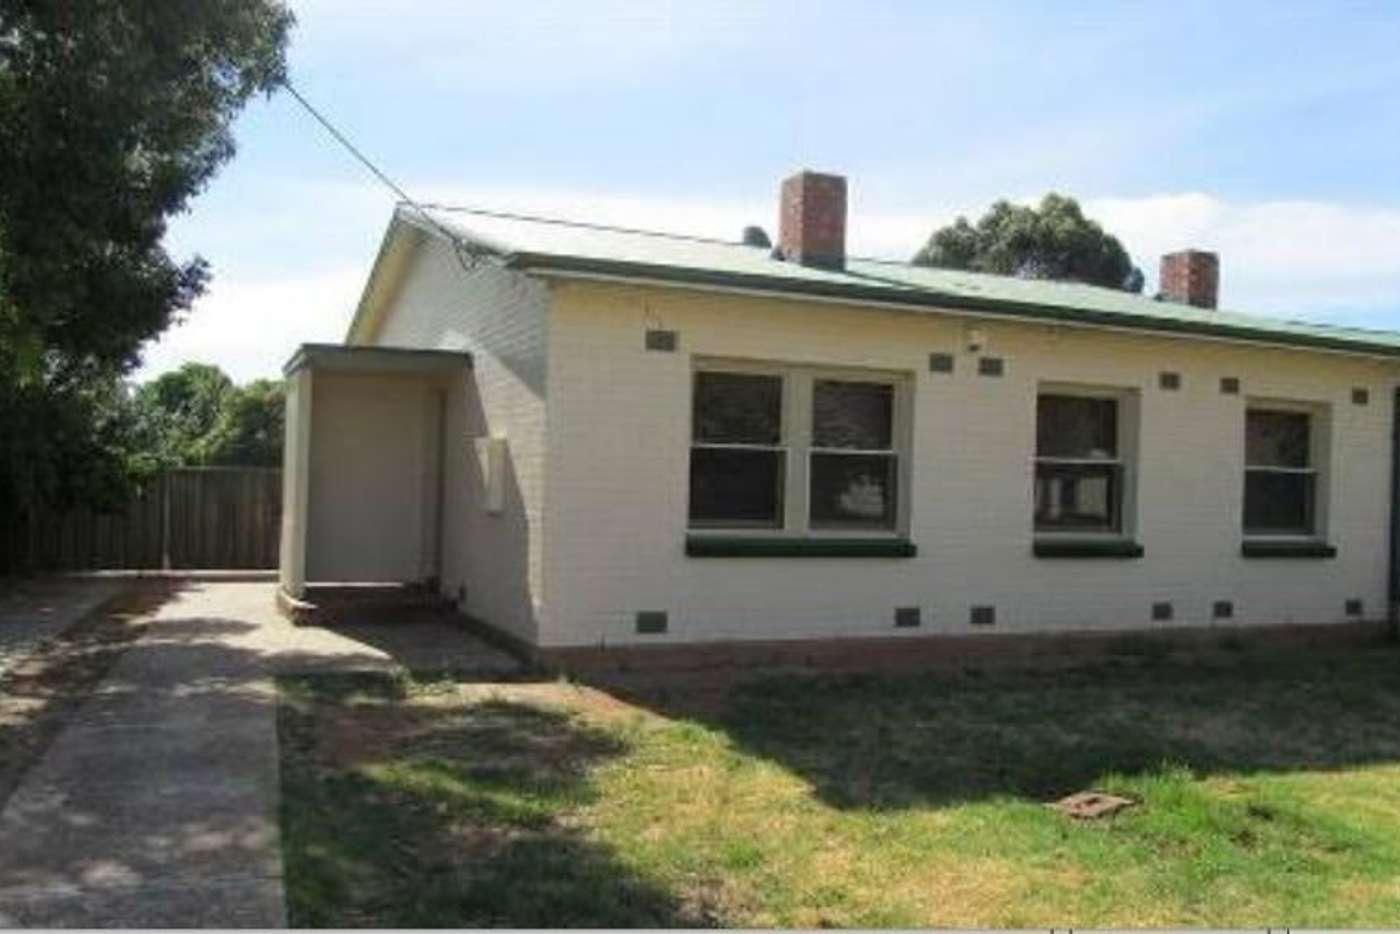 Main view of Homely house listing, 3 Drimpton Street, Davoren Park SA 5113